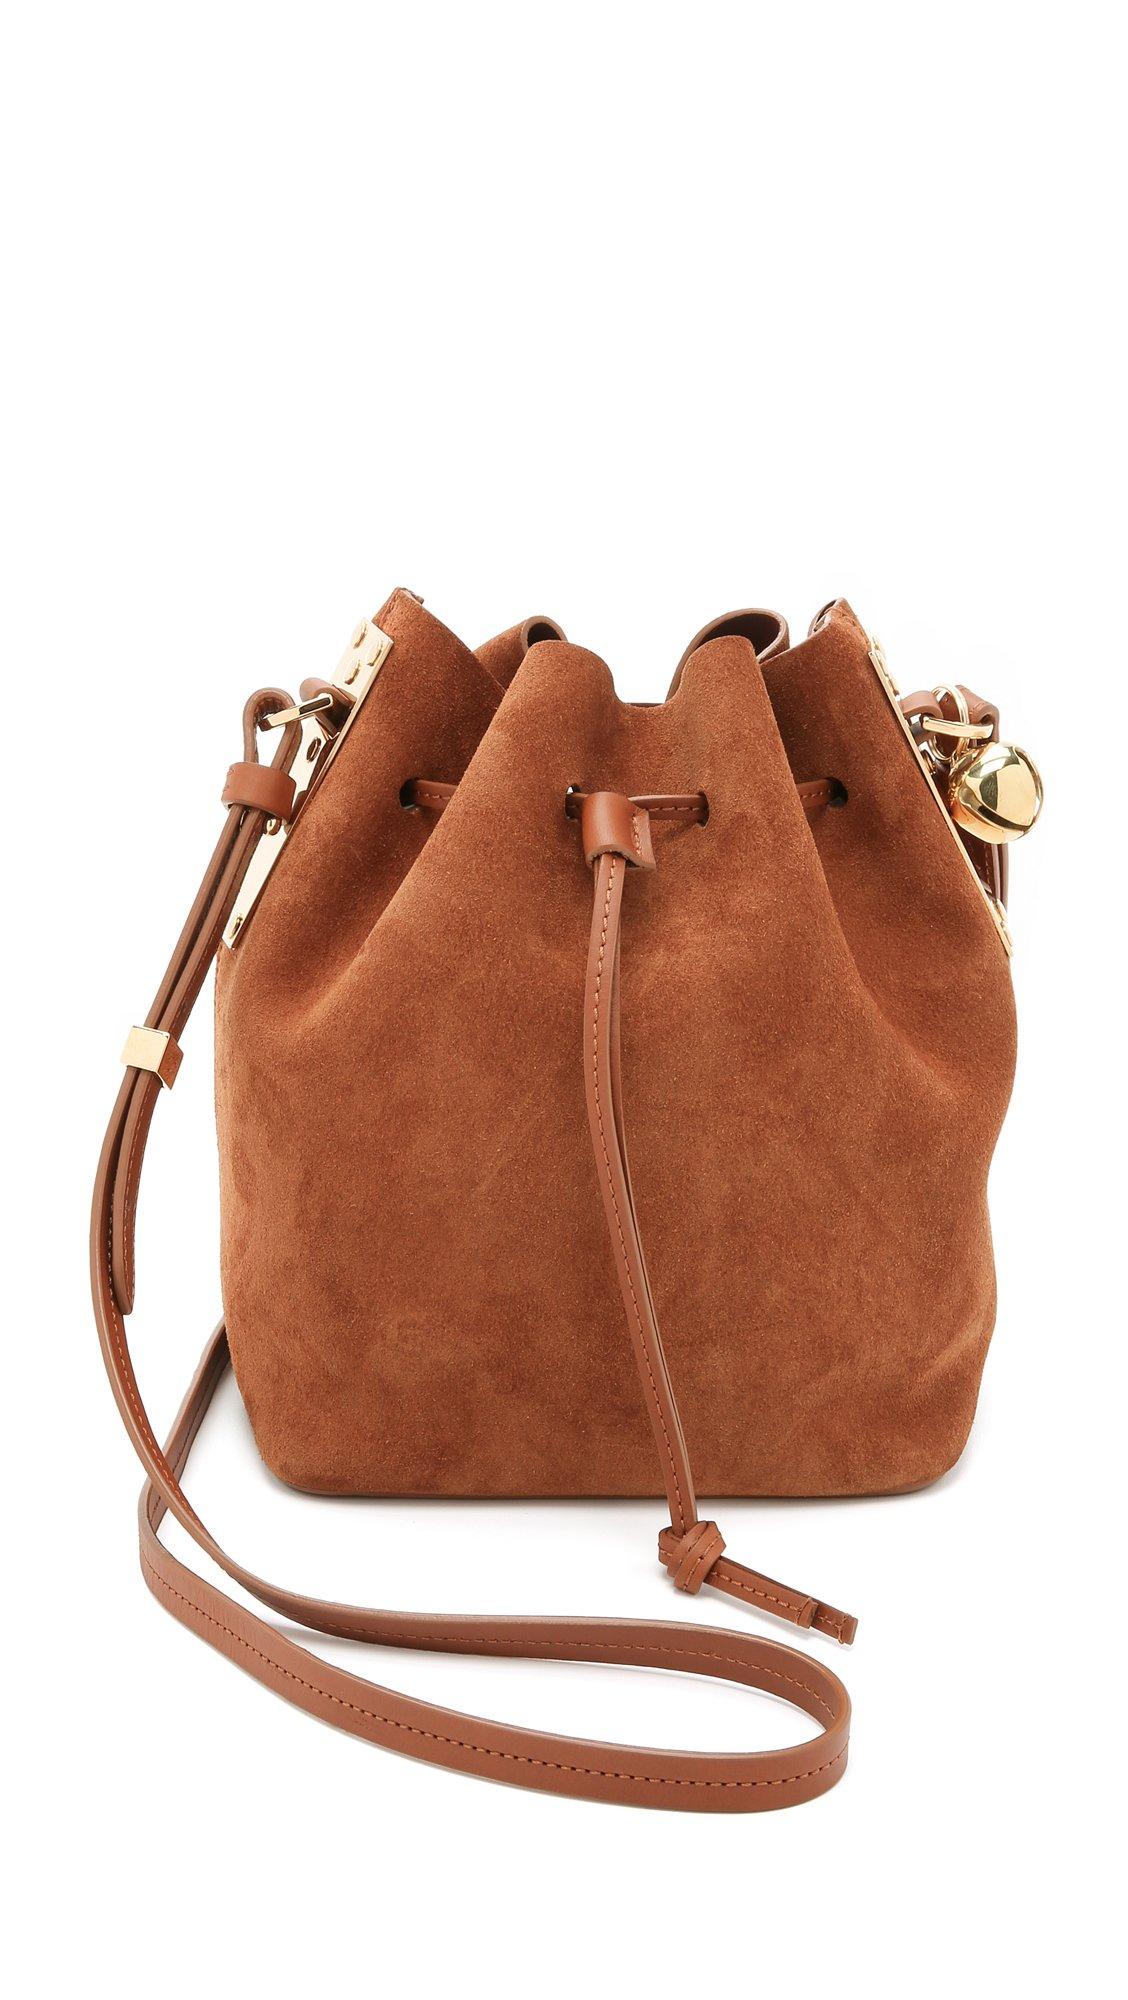 Sophie hulme Small Drawstring Bucket Bag - Tan in Brown   Lyst